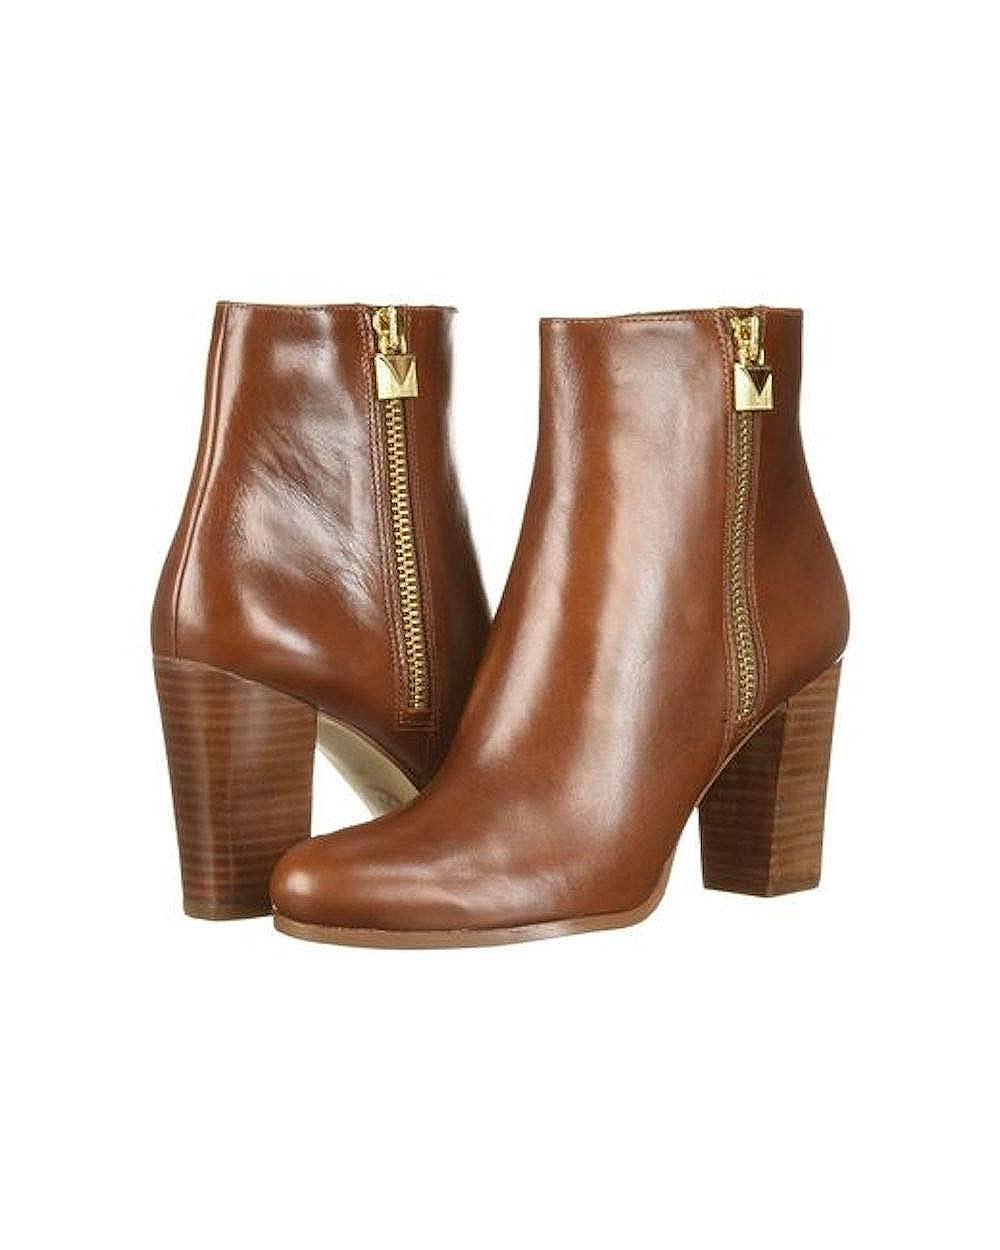 20ffad6b3d0 Michael Michael Kors Womens Margaret Bootie Leather Almond Toe Ankle Fashion